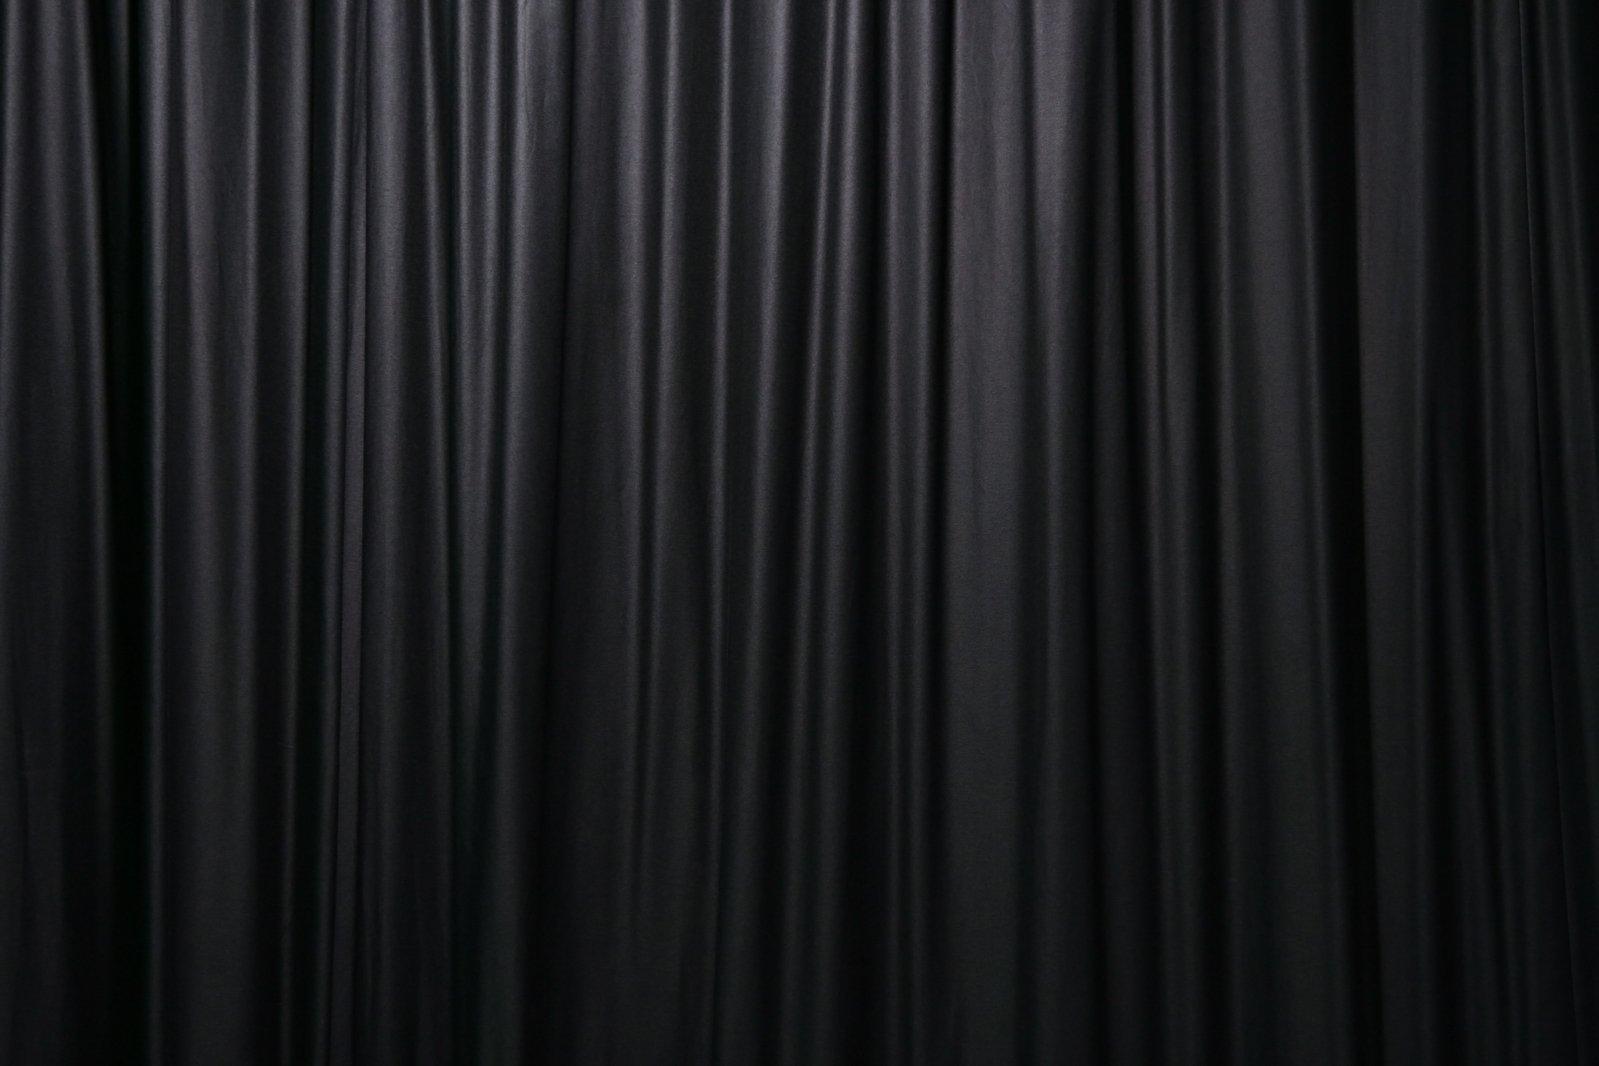 black-curtain-1159588